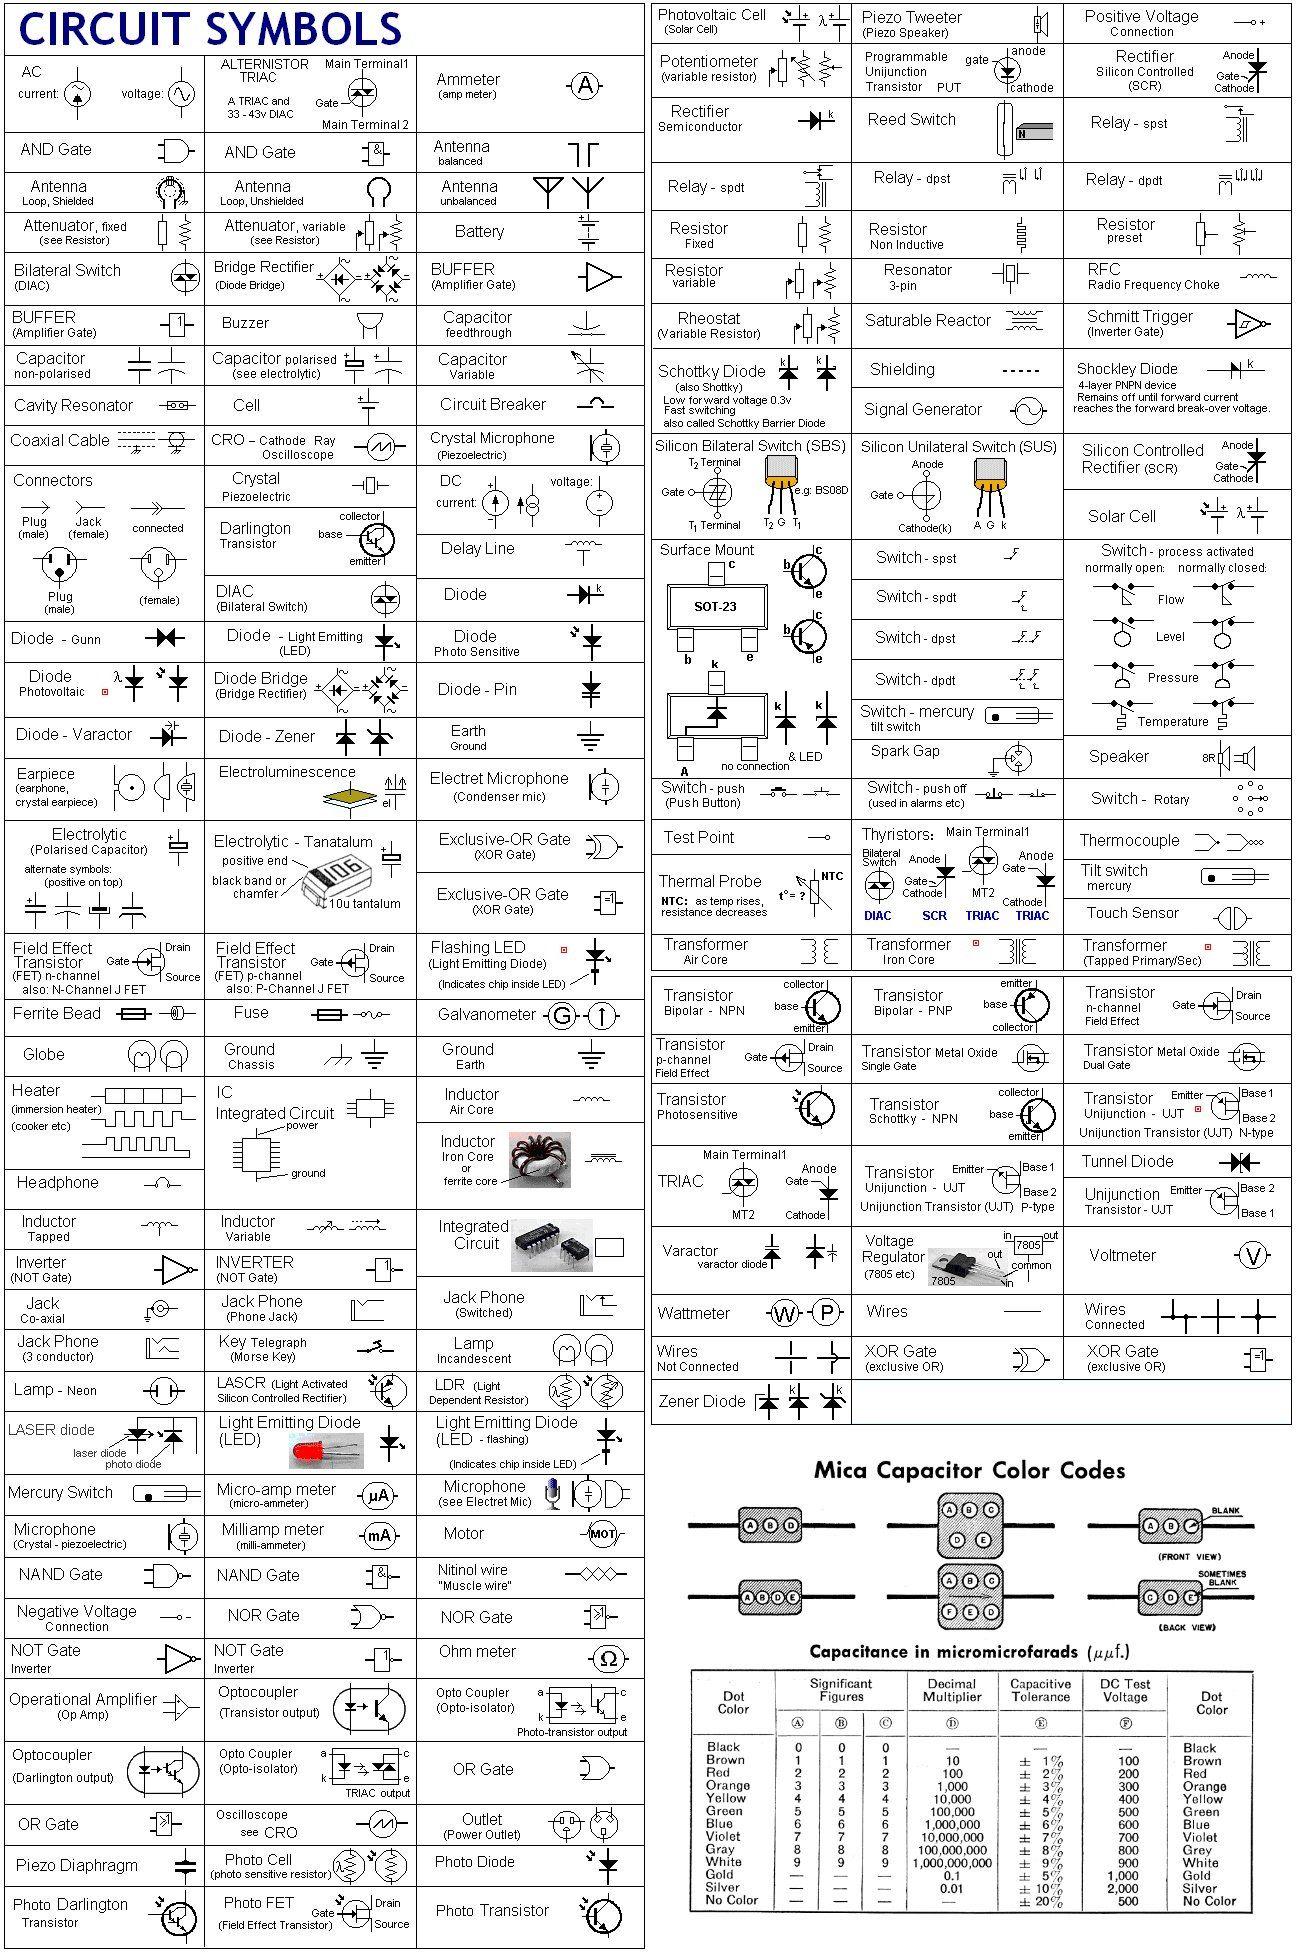 Electric Circuit Symbols 1297x1953